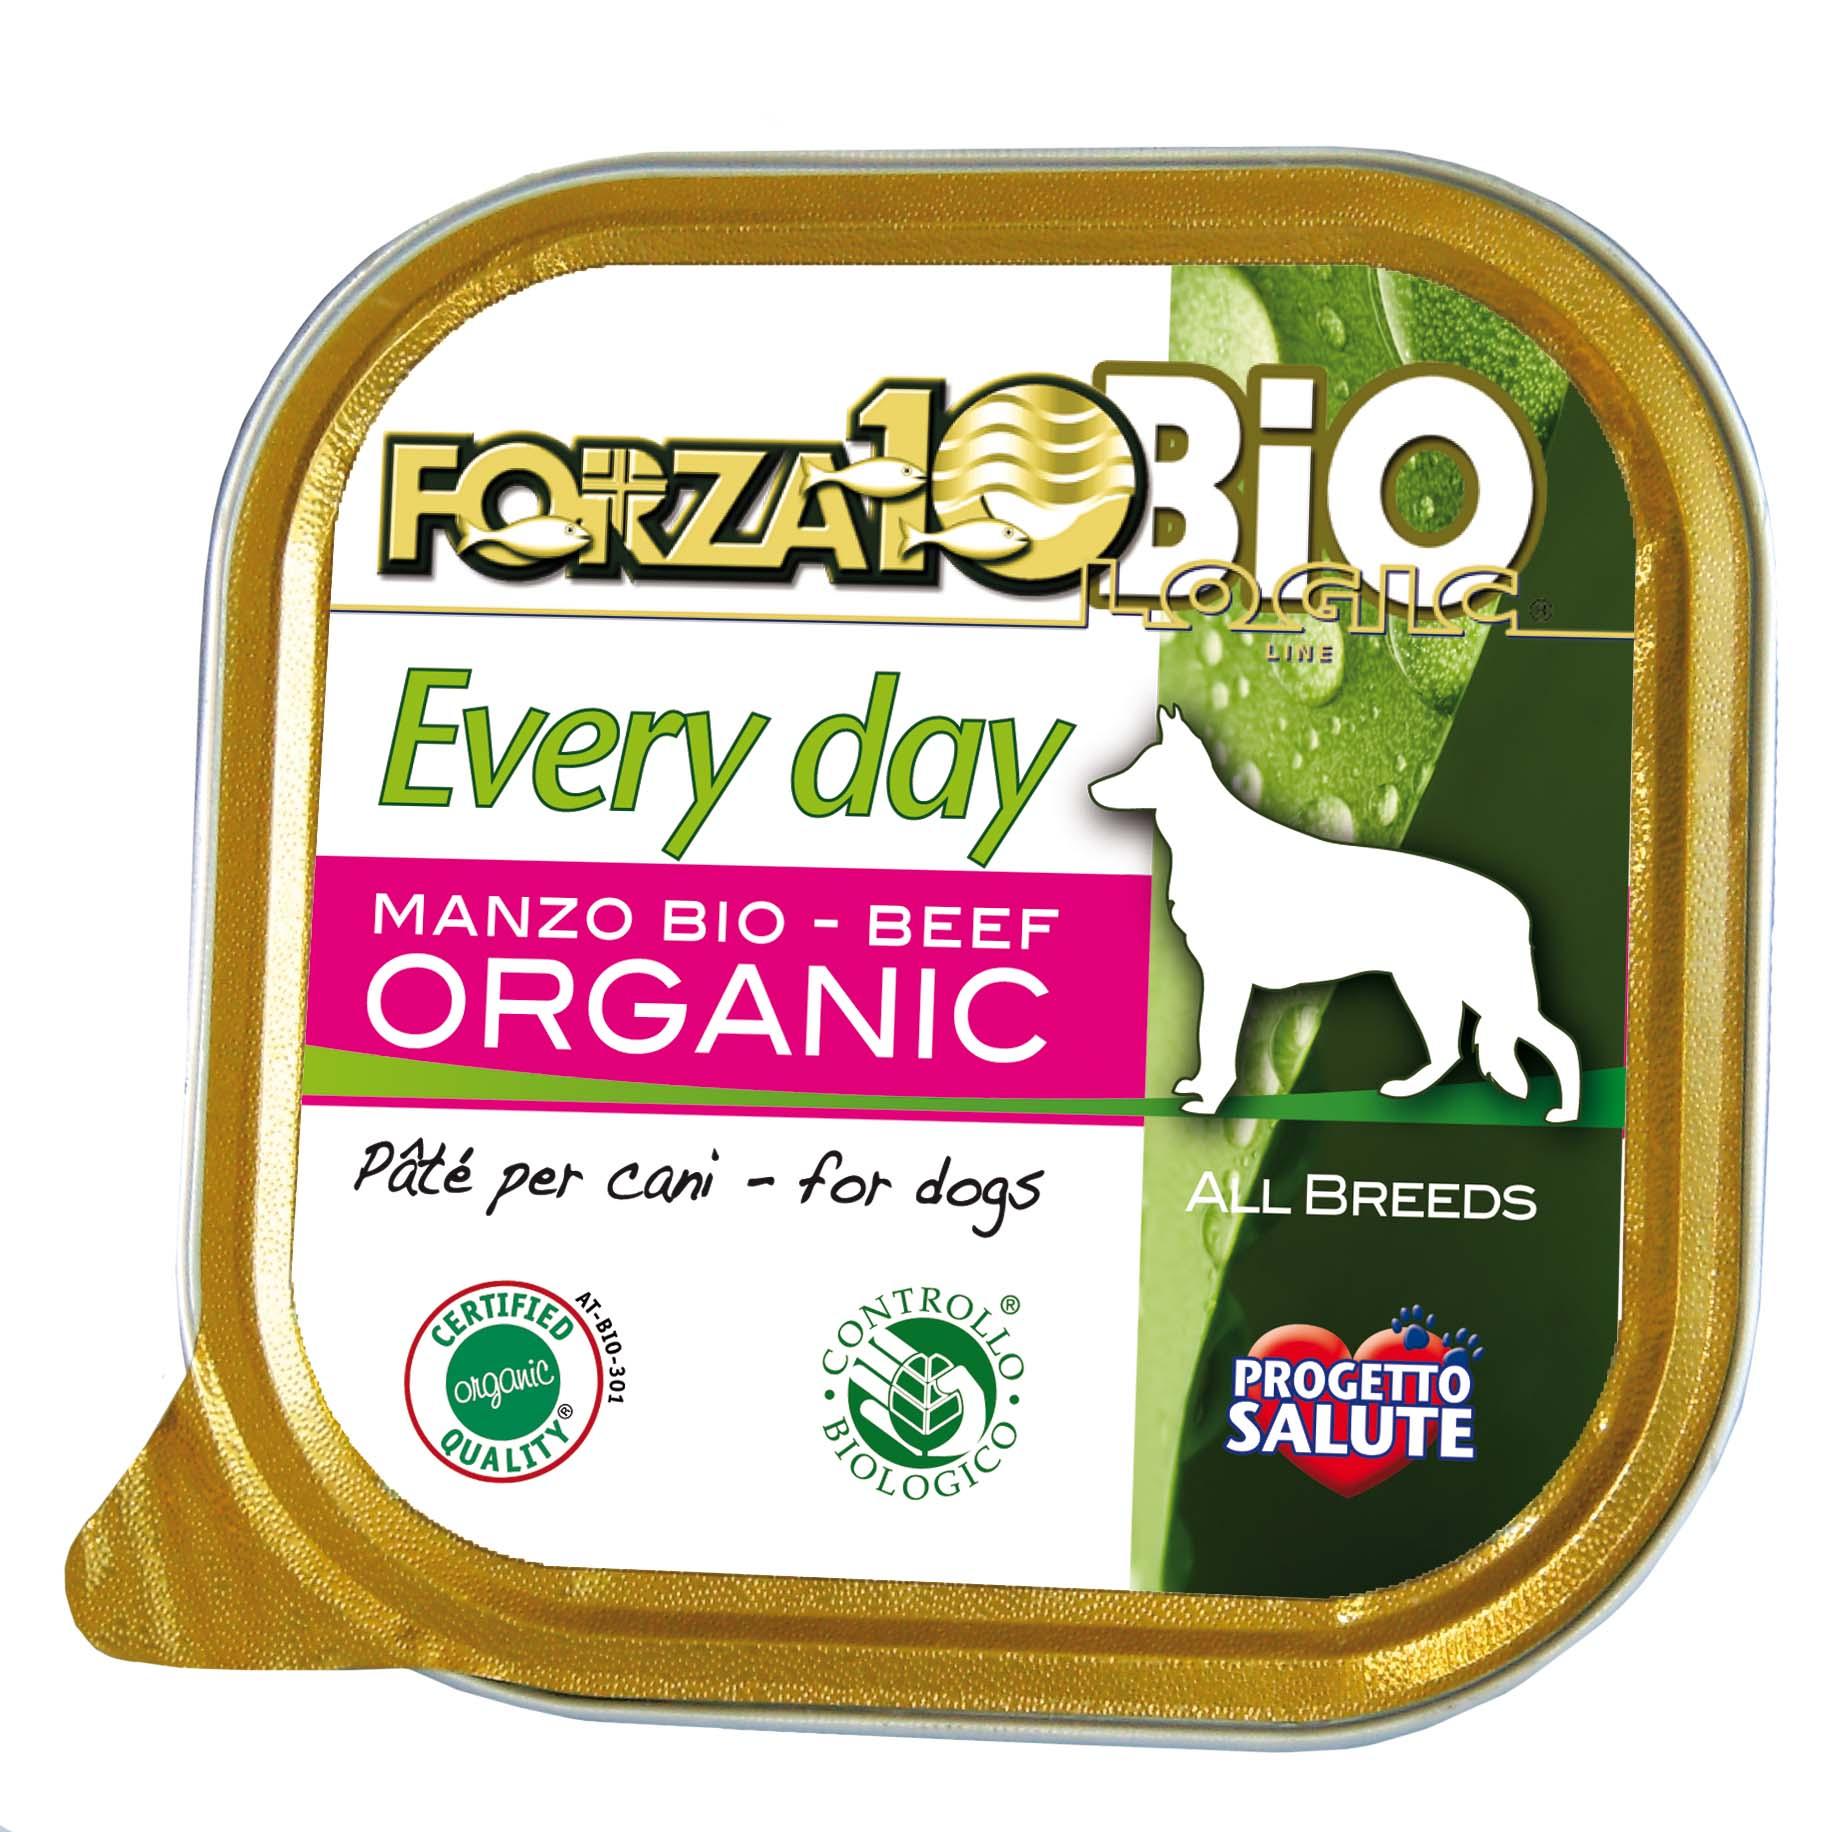 FORZA10 BIO - Every Day PERRO Ternera 300g